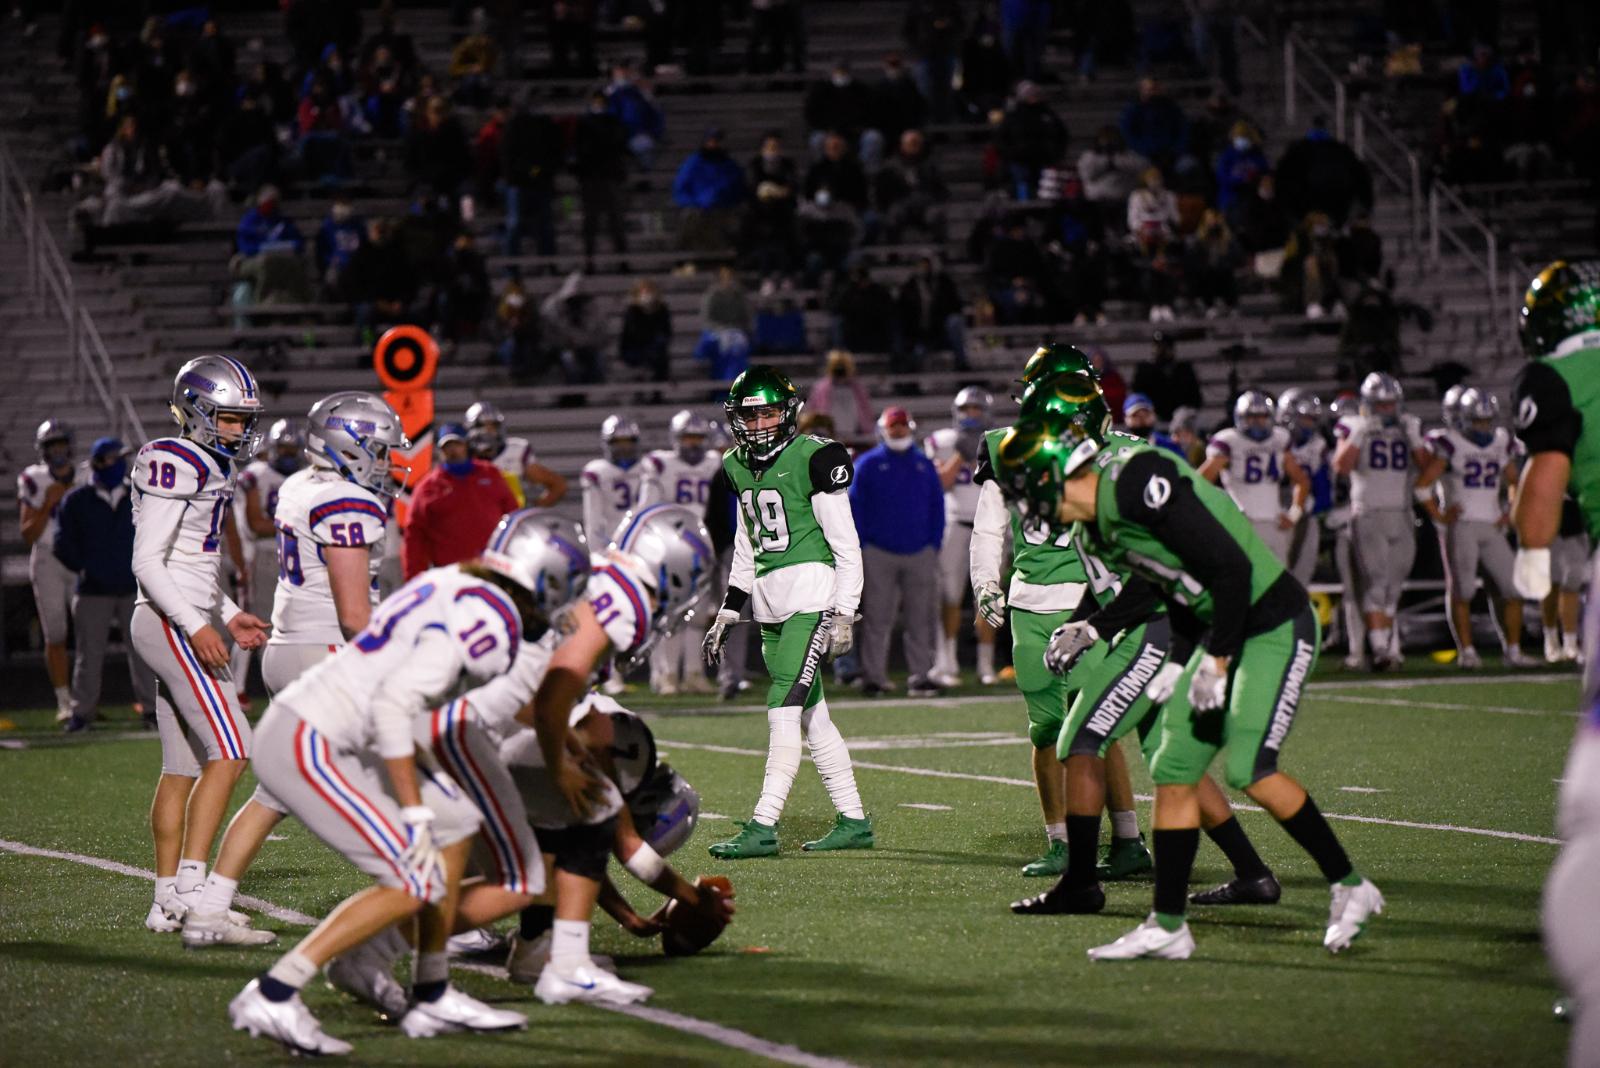 Northmont vs Springfield football – CANCELLED